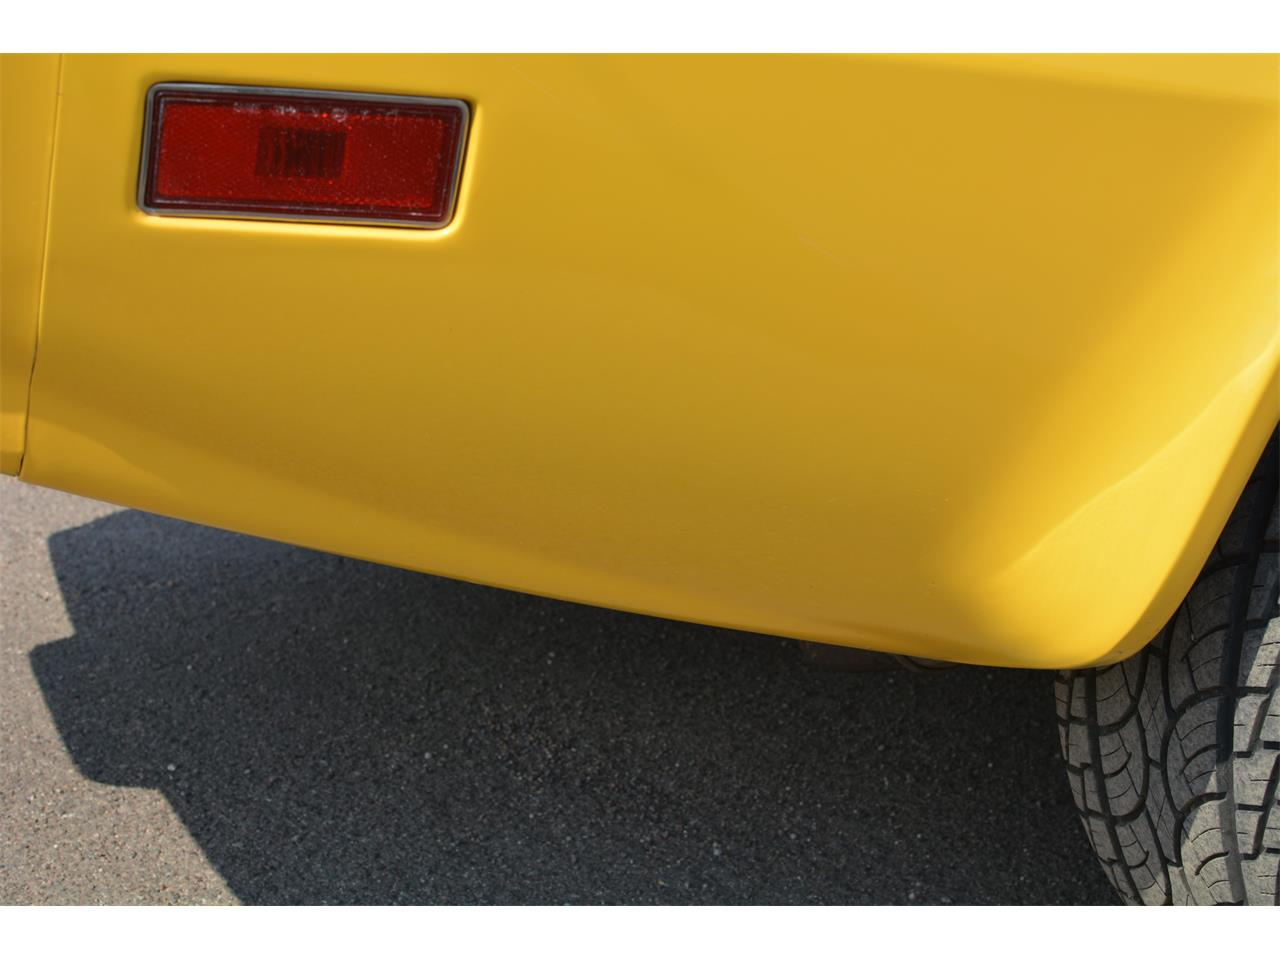 Large Picture of 1981 Chevrolet Corvette located in Wittmann Arizona - $14,000.00 - LGQ7